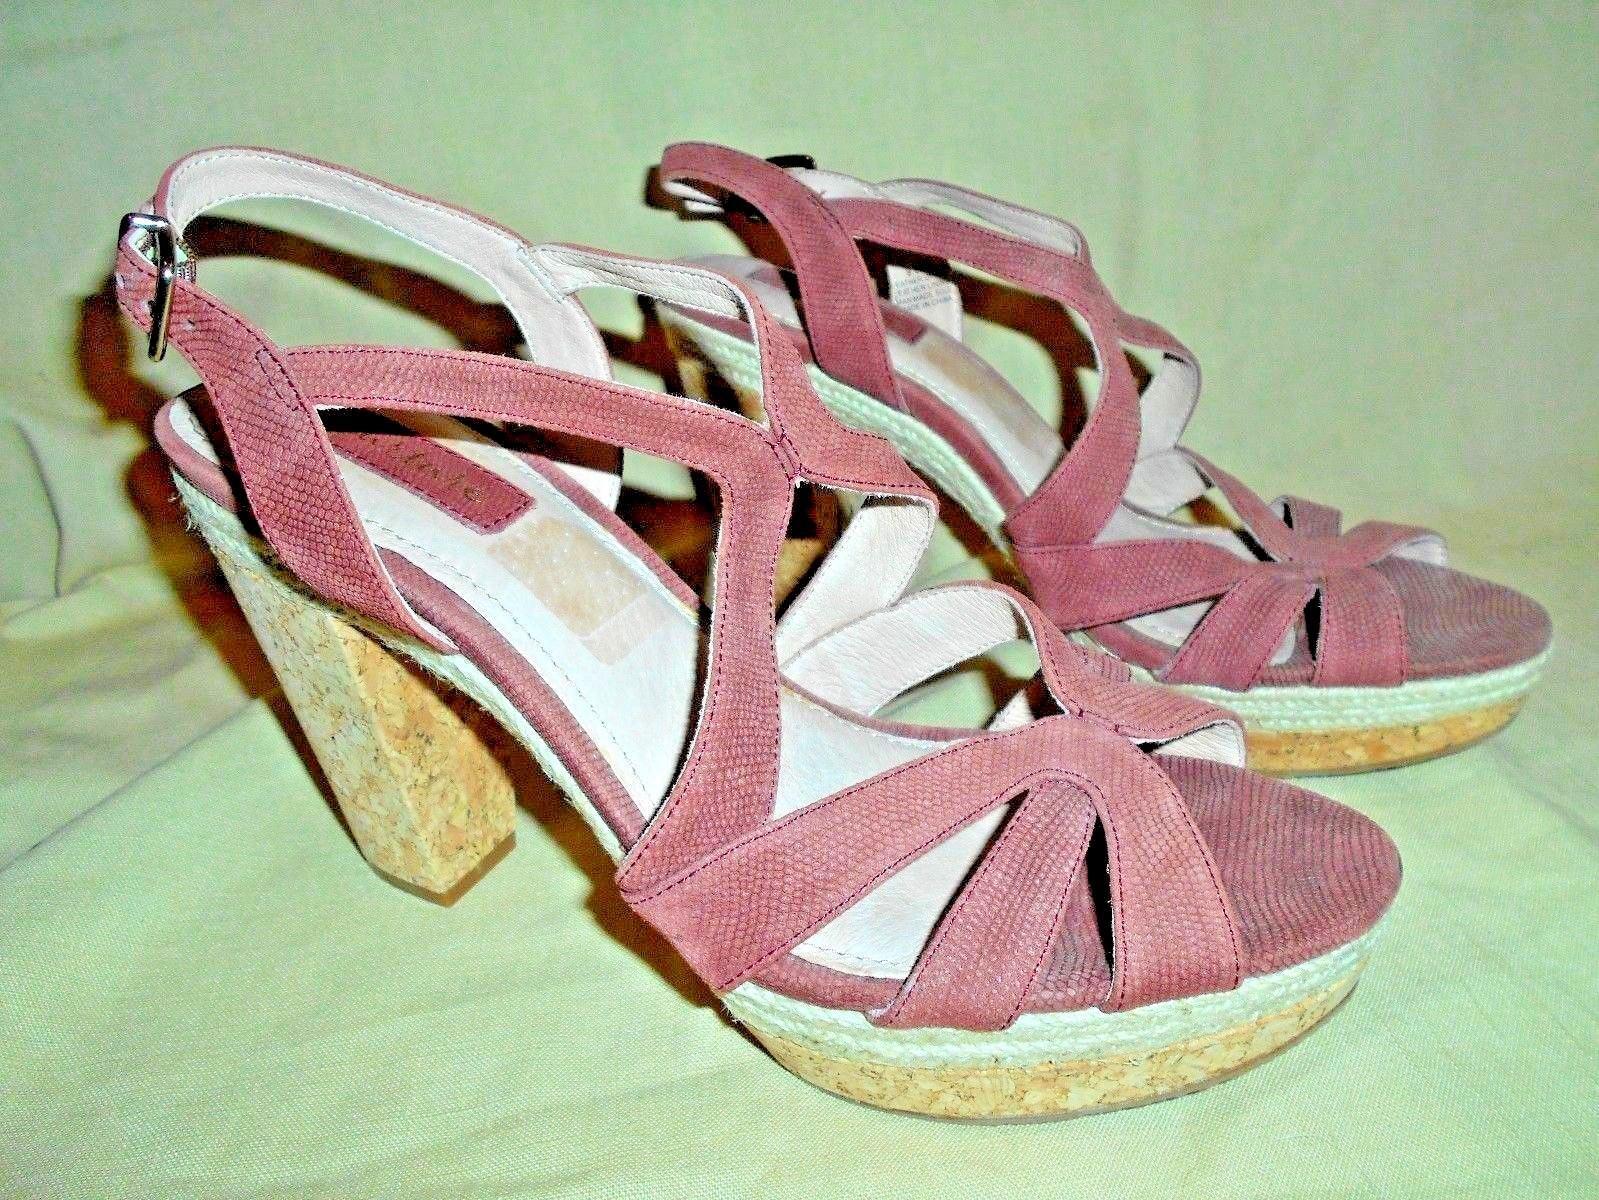 NURTURE ladies rust color platform high heel cork sandals 8.5M NWOB